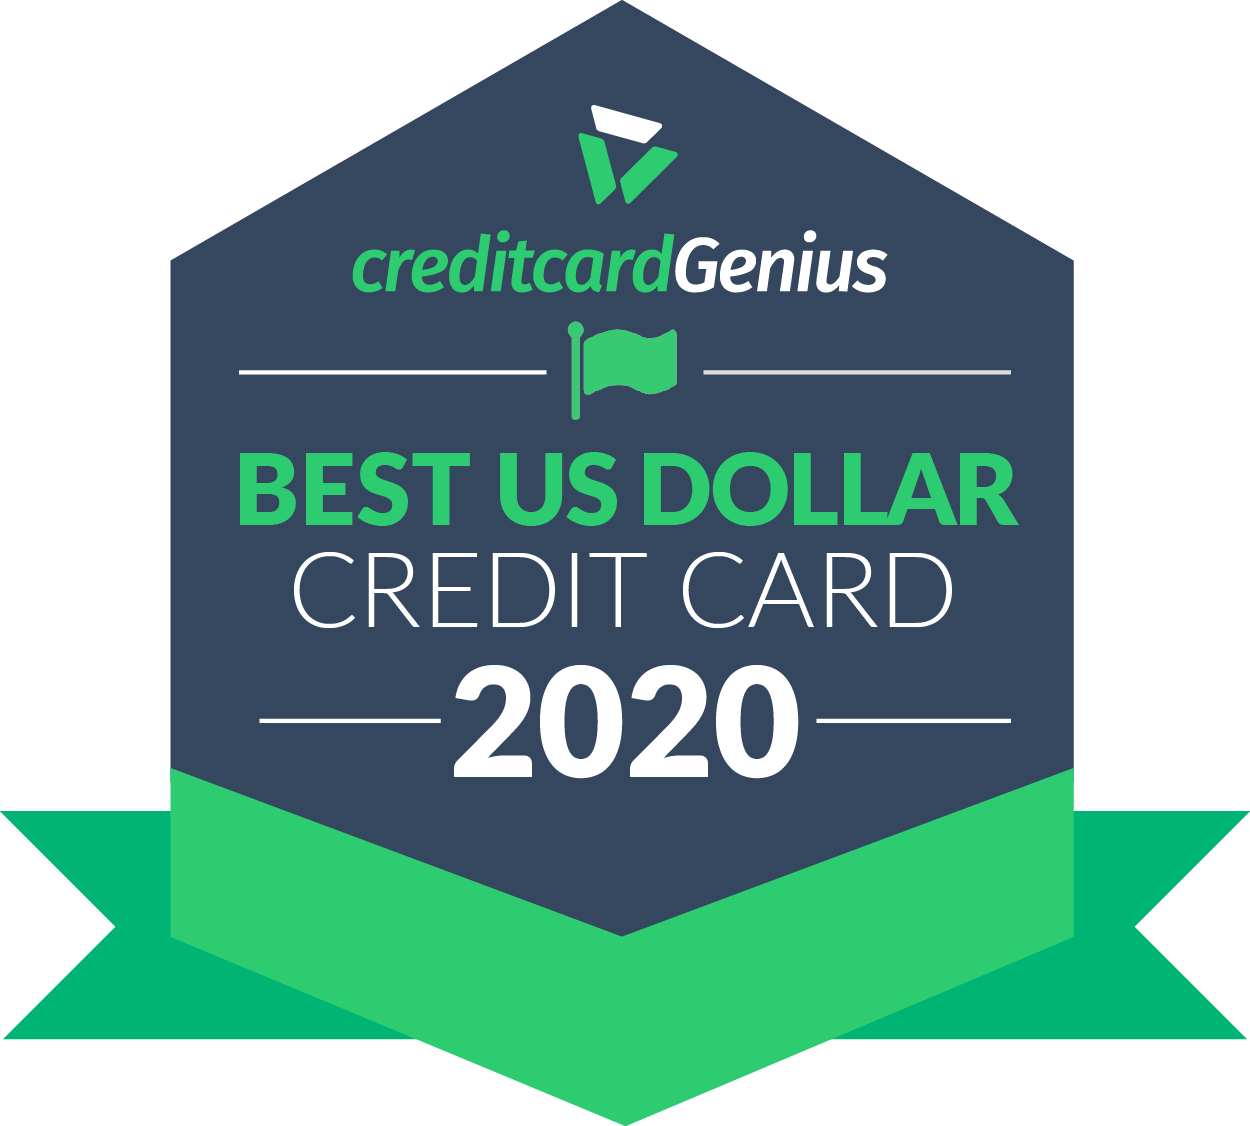 Best U.S. dollar credit card in Canada for 2020 award seal